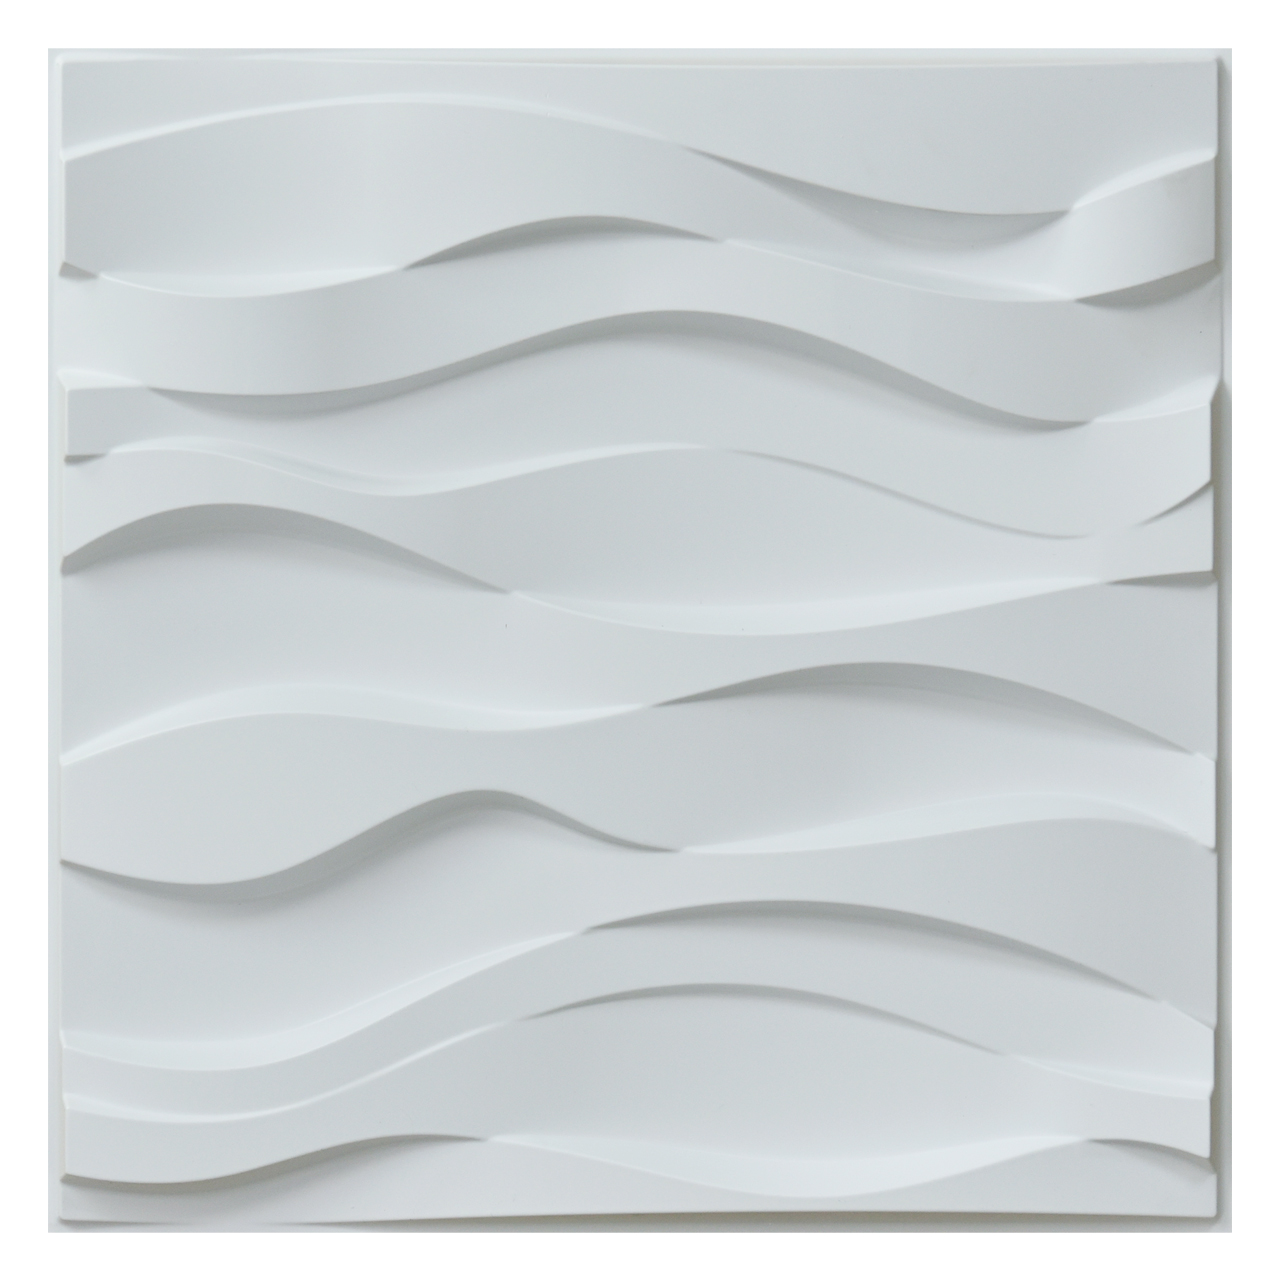 3D Wall Panel PVC Wave Wall Design, White, 12 Tiles 32 SF